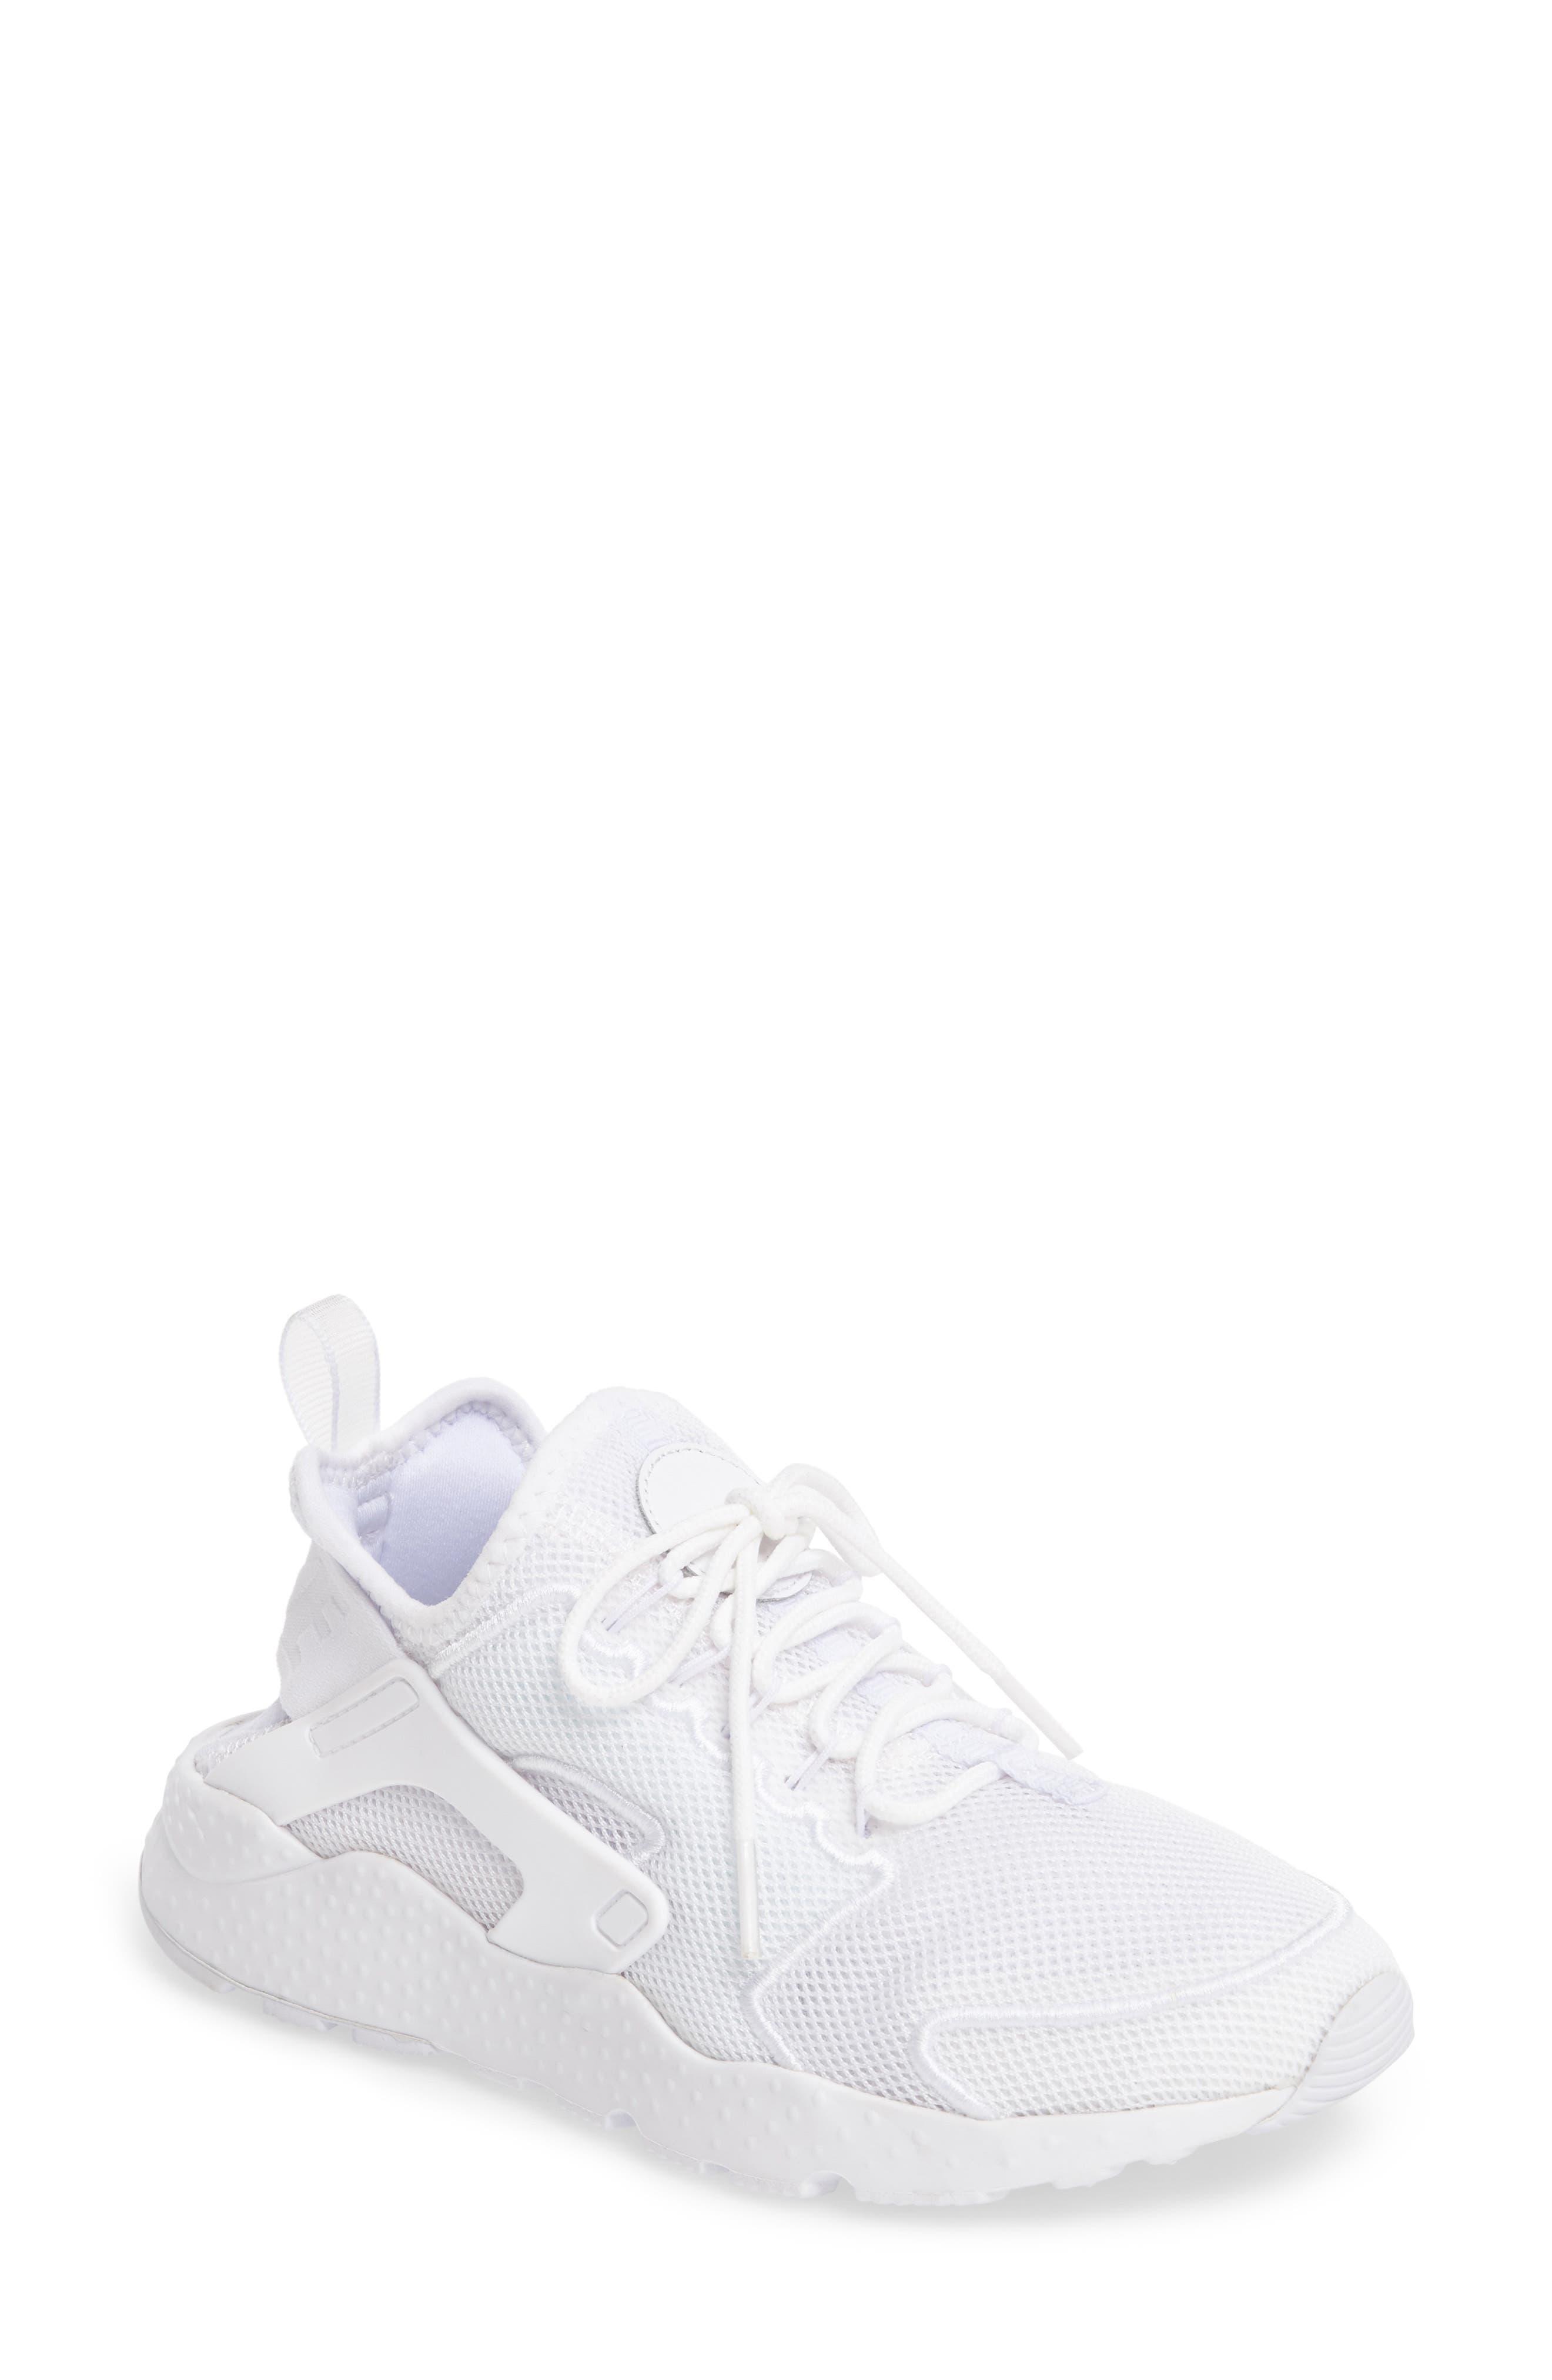 Main Image - Nike 'Air Huarache Run Ultra Mesh' Sneaker (Women)